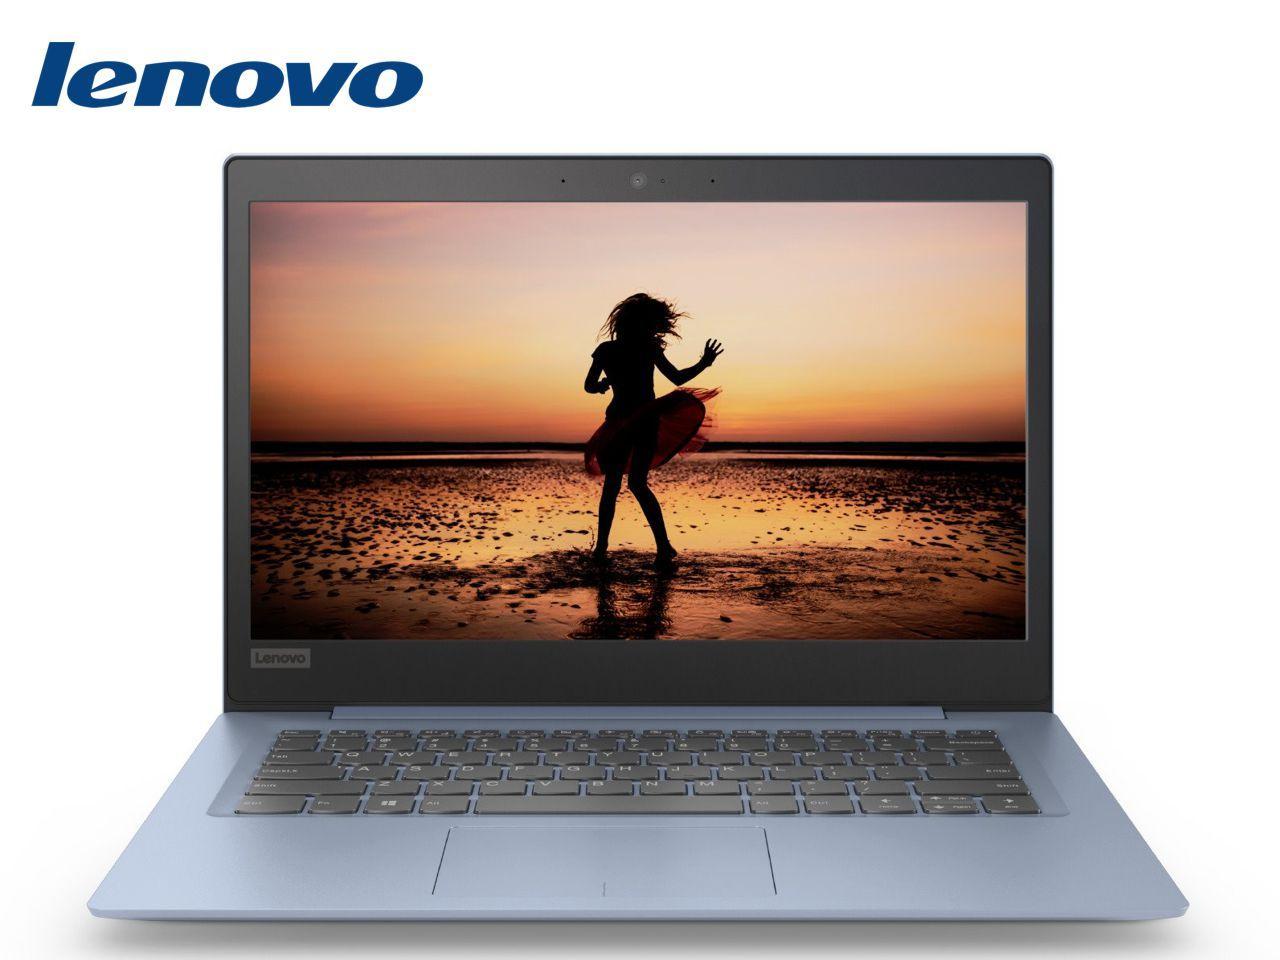 LENOVO IdeaPad 120S-14IAP (81A500G6CK)